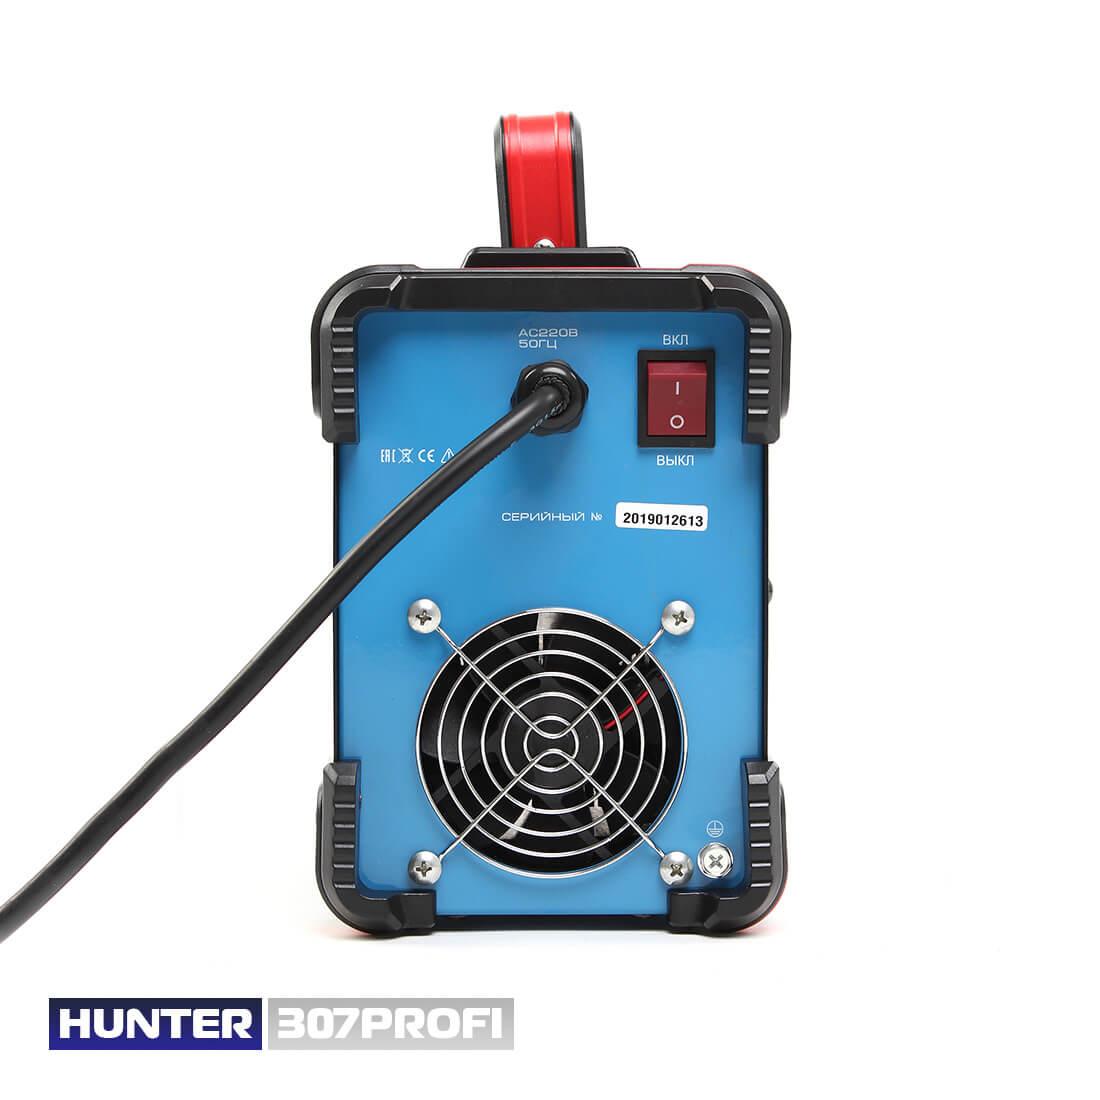 Фото Hunter MMA 307 PROFI (дуговая) цена 3150грн №5 — Hunter